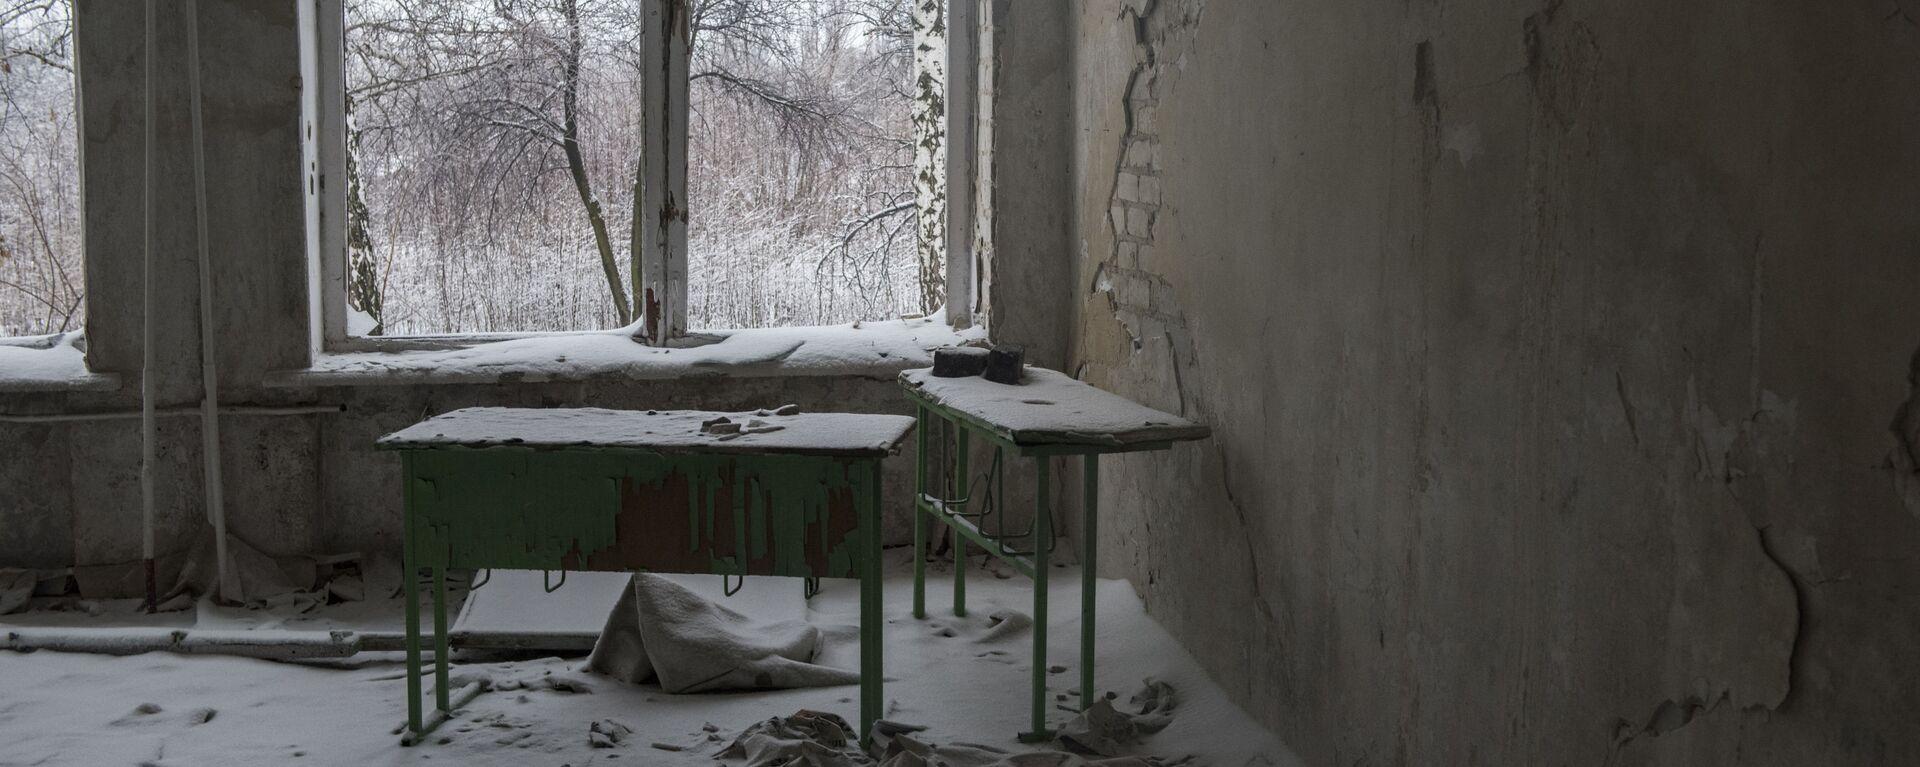 Konflikt zbrojny w Donbasie - Sputnik Polska, 1920, 14.03.2021